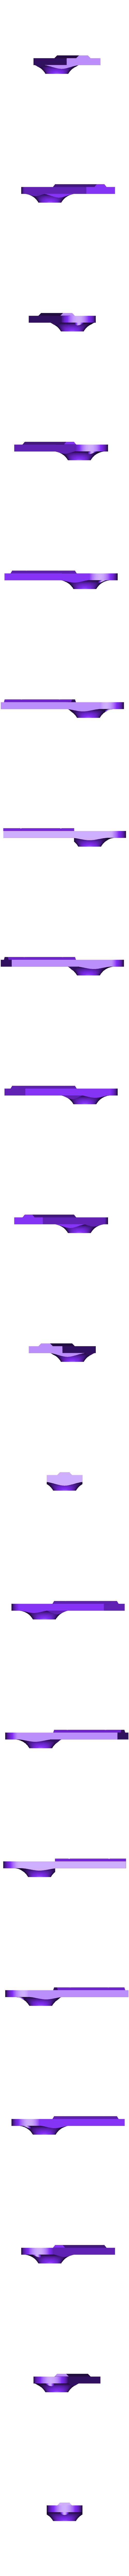 piece_poulie_.STL Download free STL file stepper support v-slot 2040 • 3D print object, vingautmobile